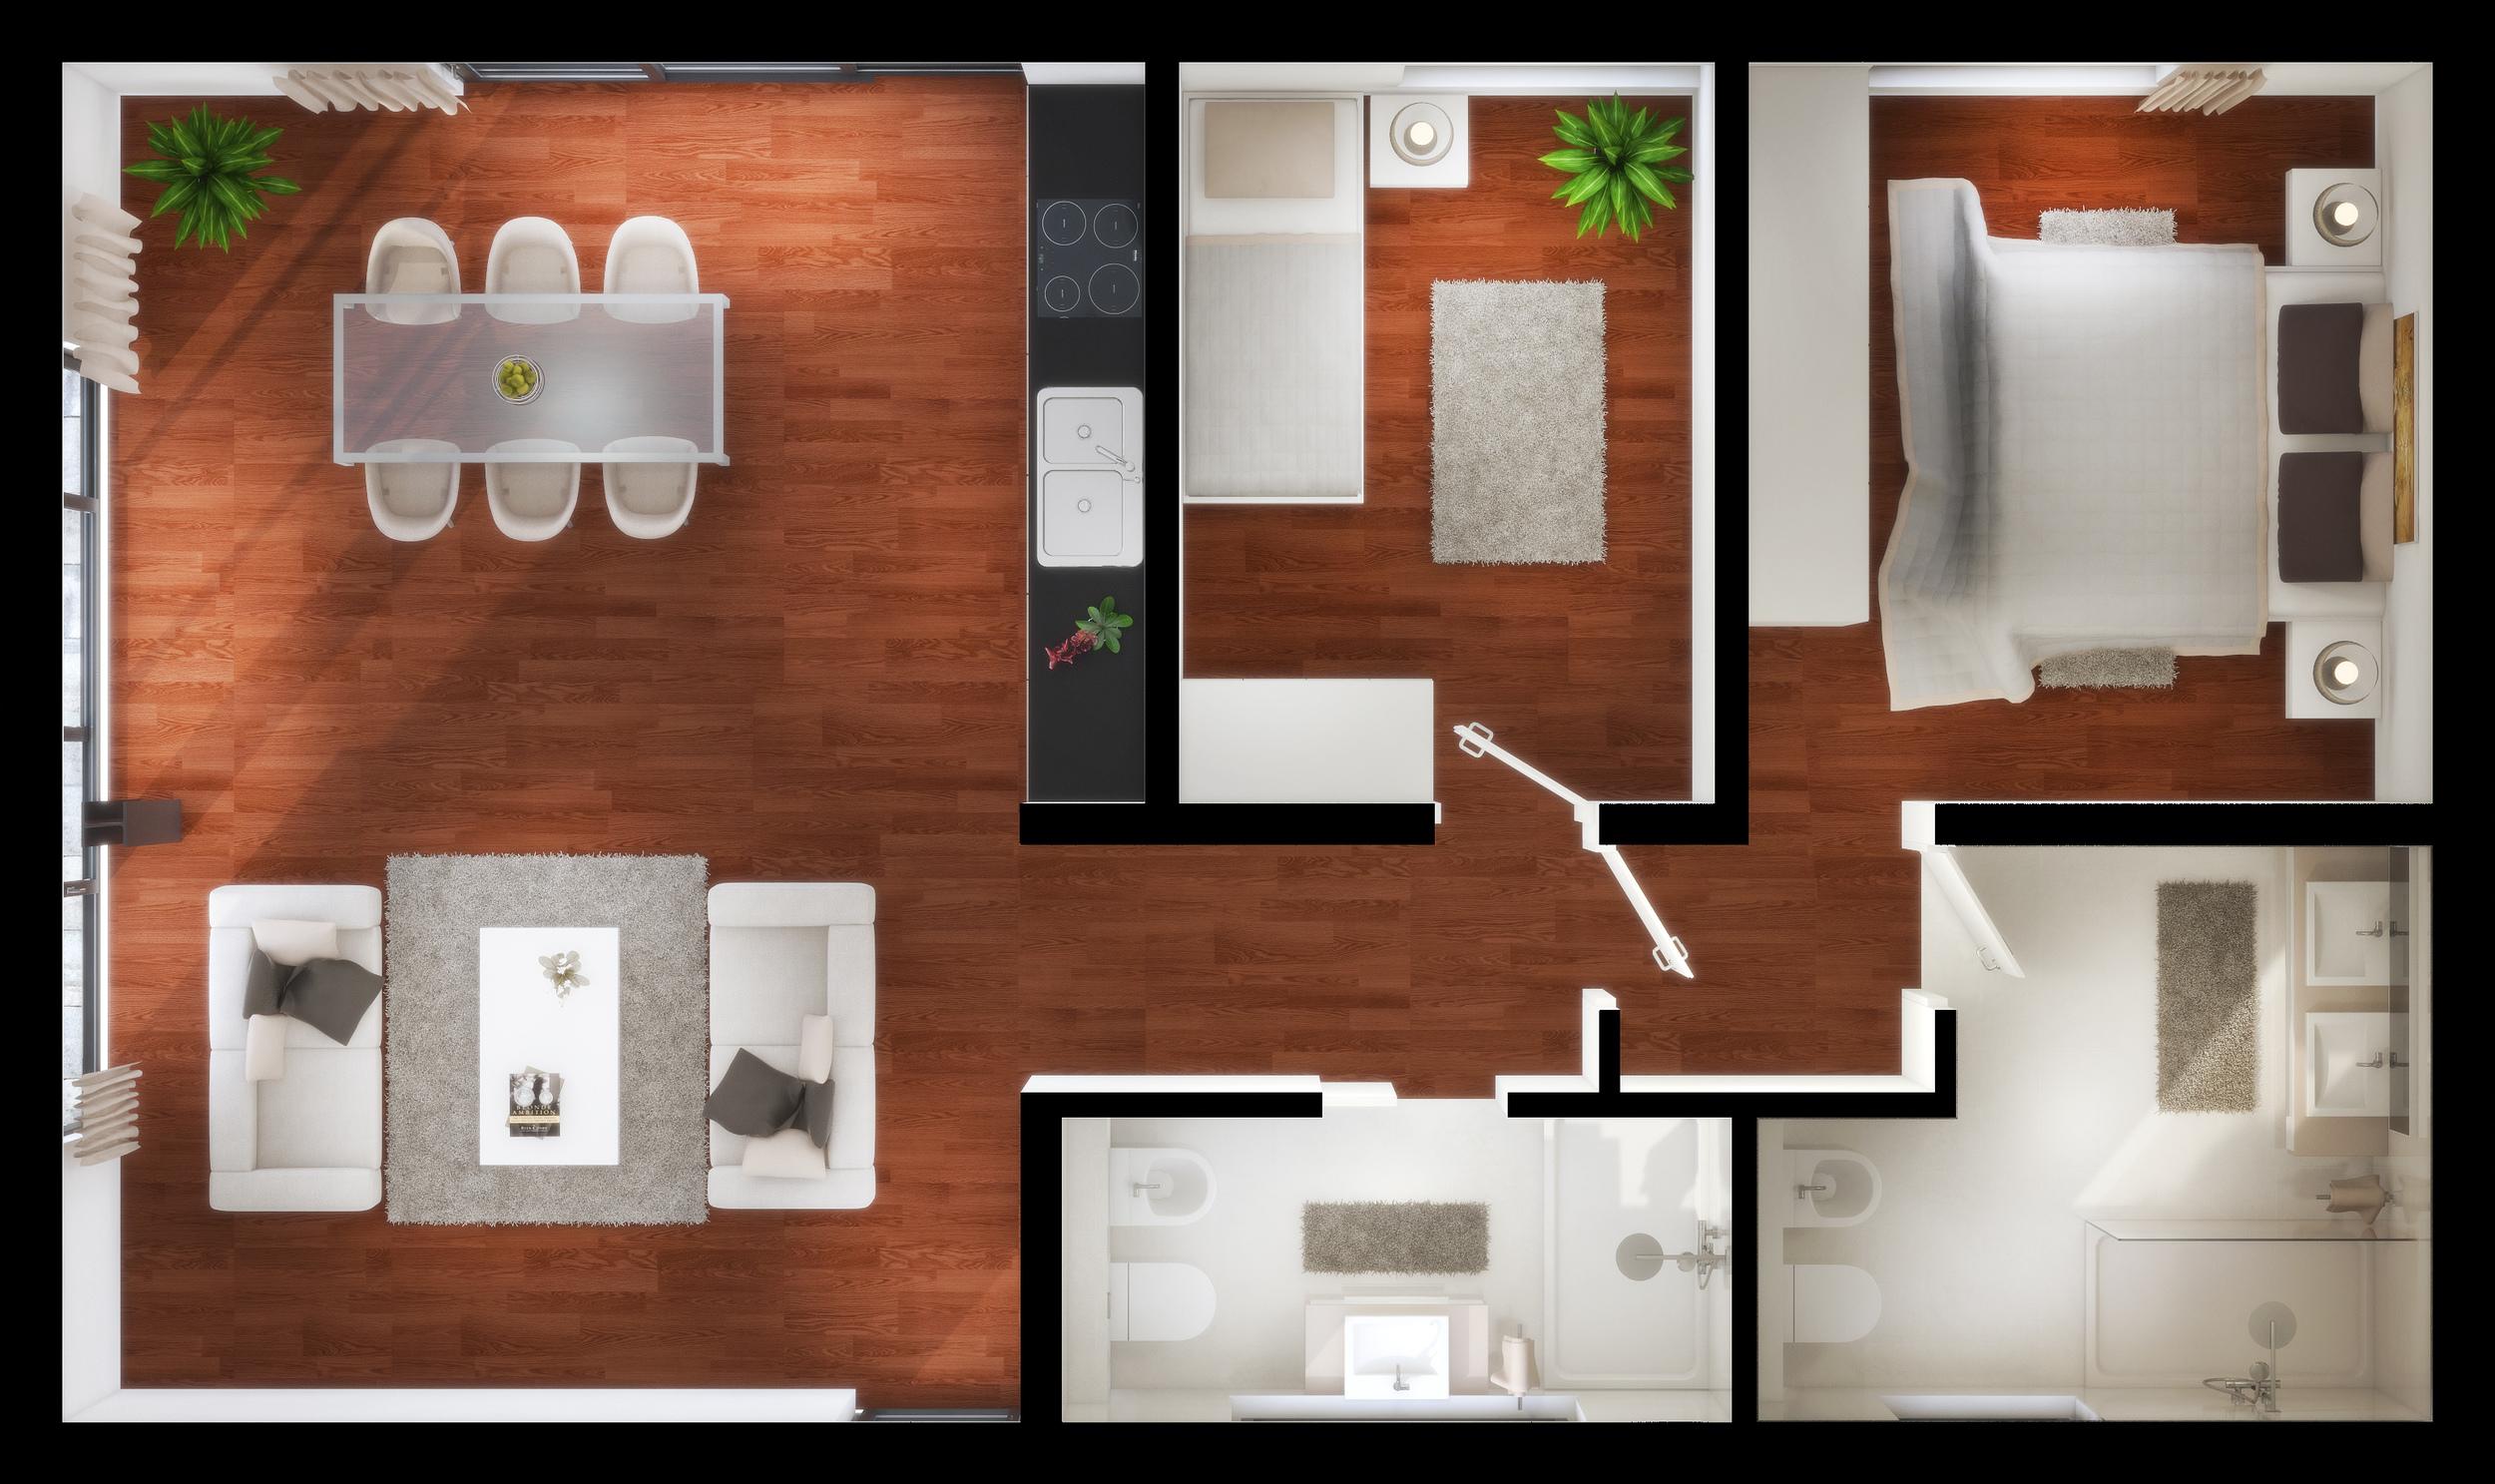 tlocrt_prizemlje_apartman.jpg